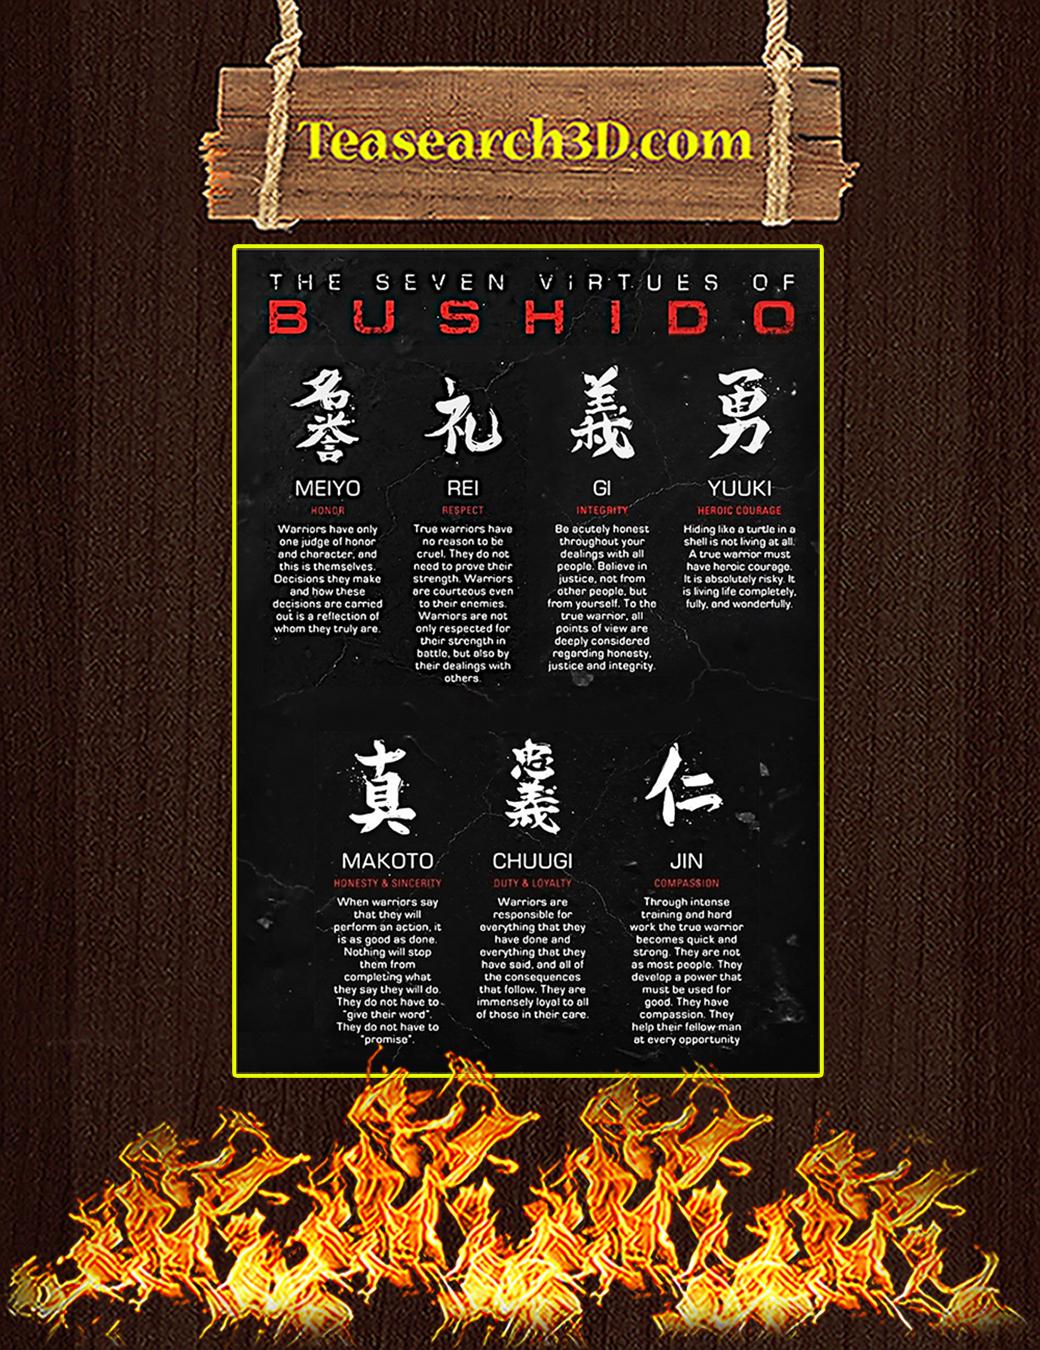 The Seven Virtues Of Bushido Samurai Poster A1